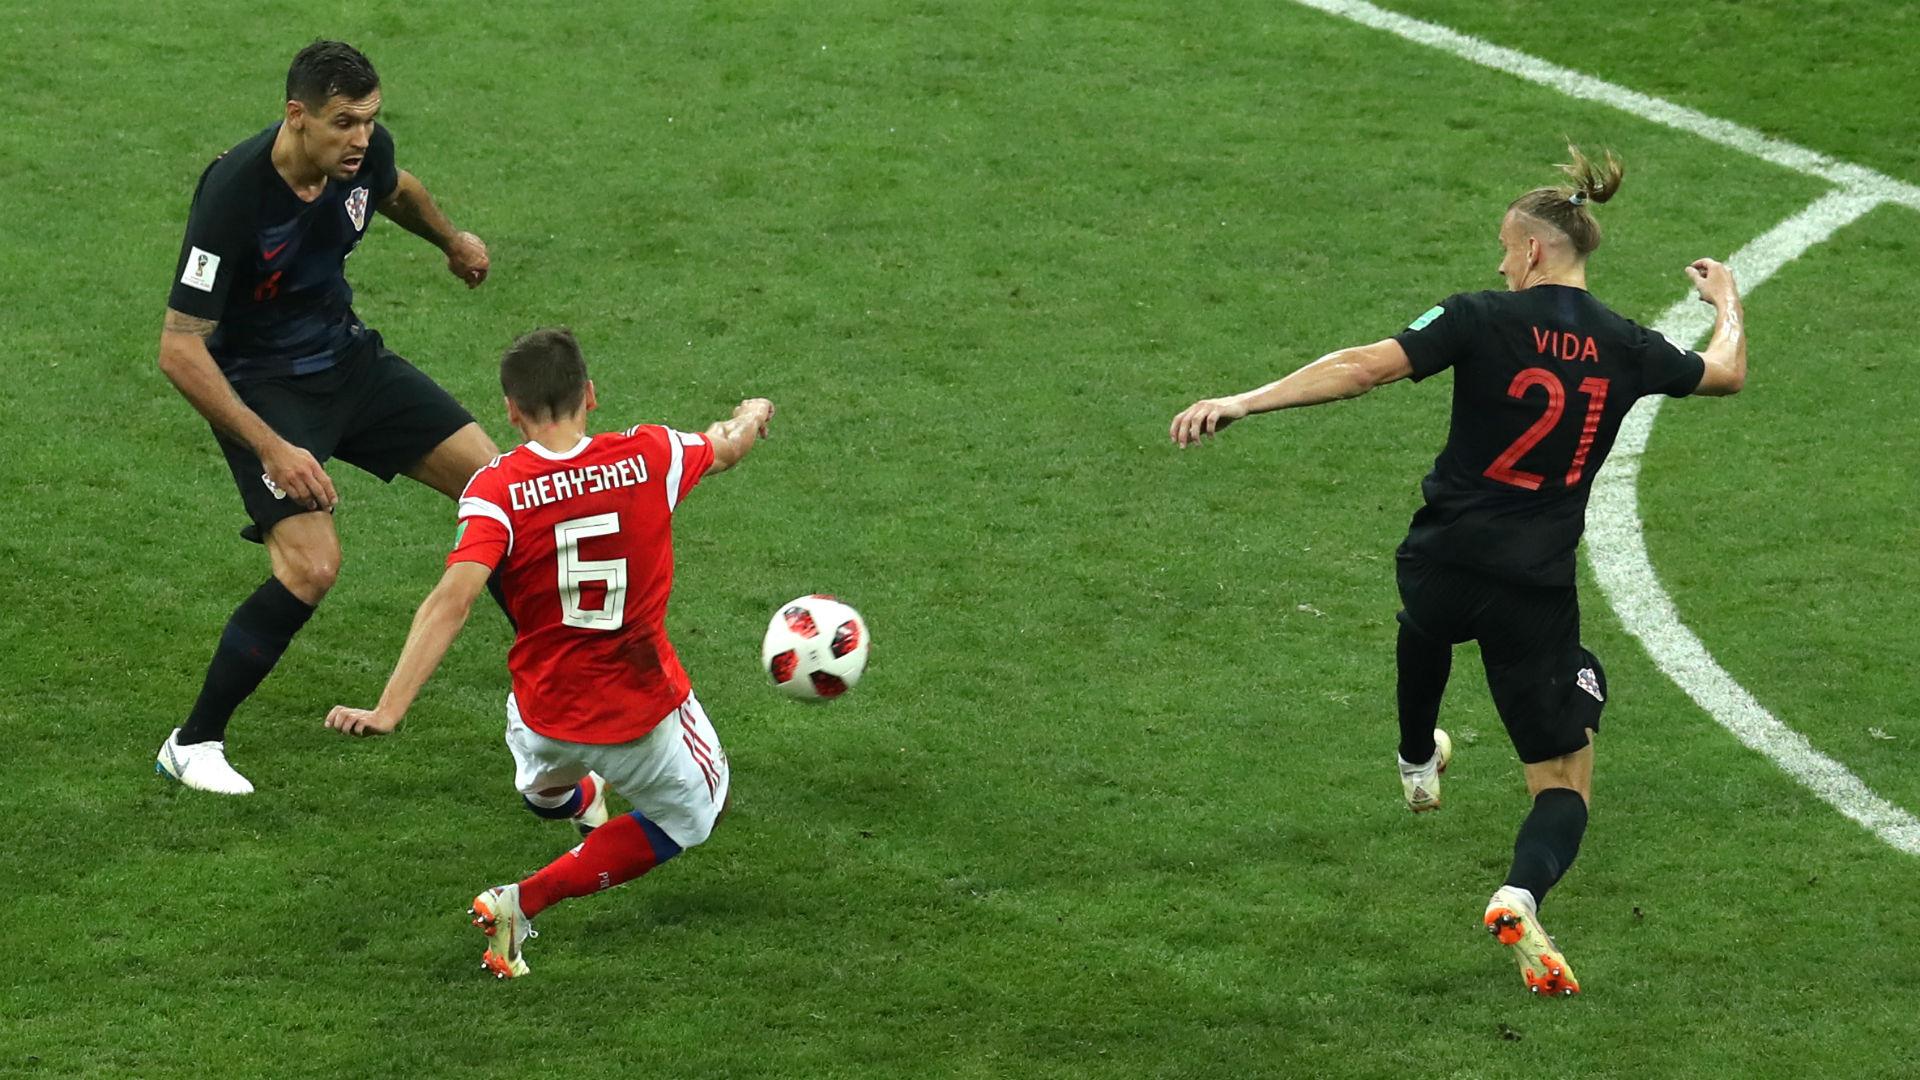 Cherychev Rússia Croacia Copa do Mundo 07 07 2018